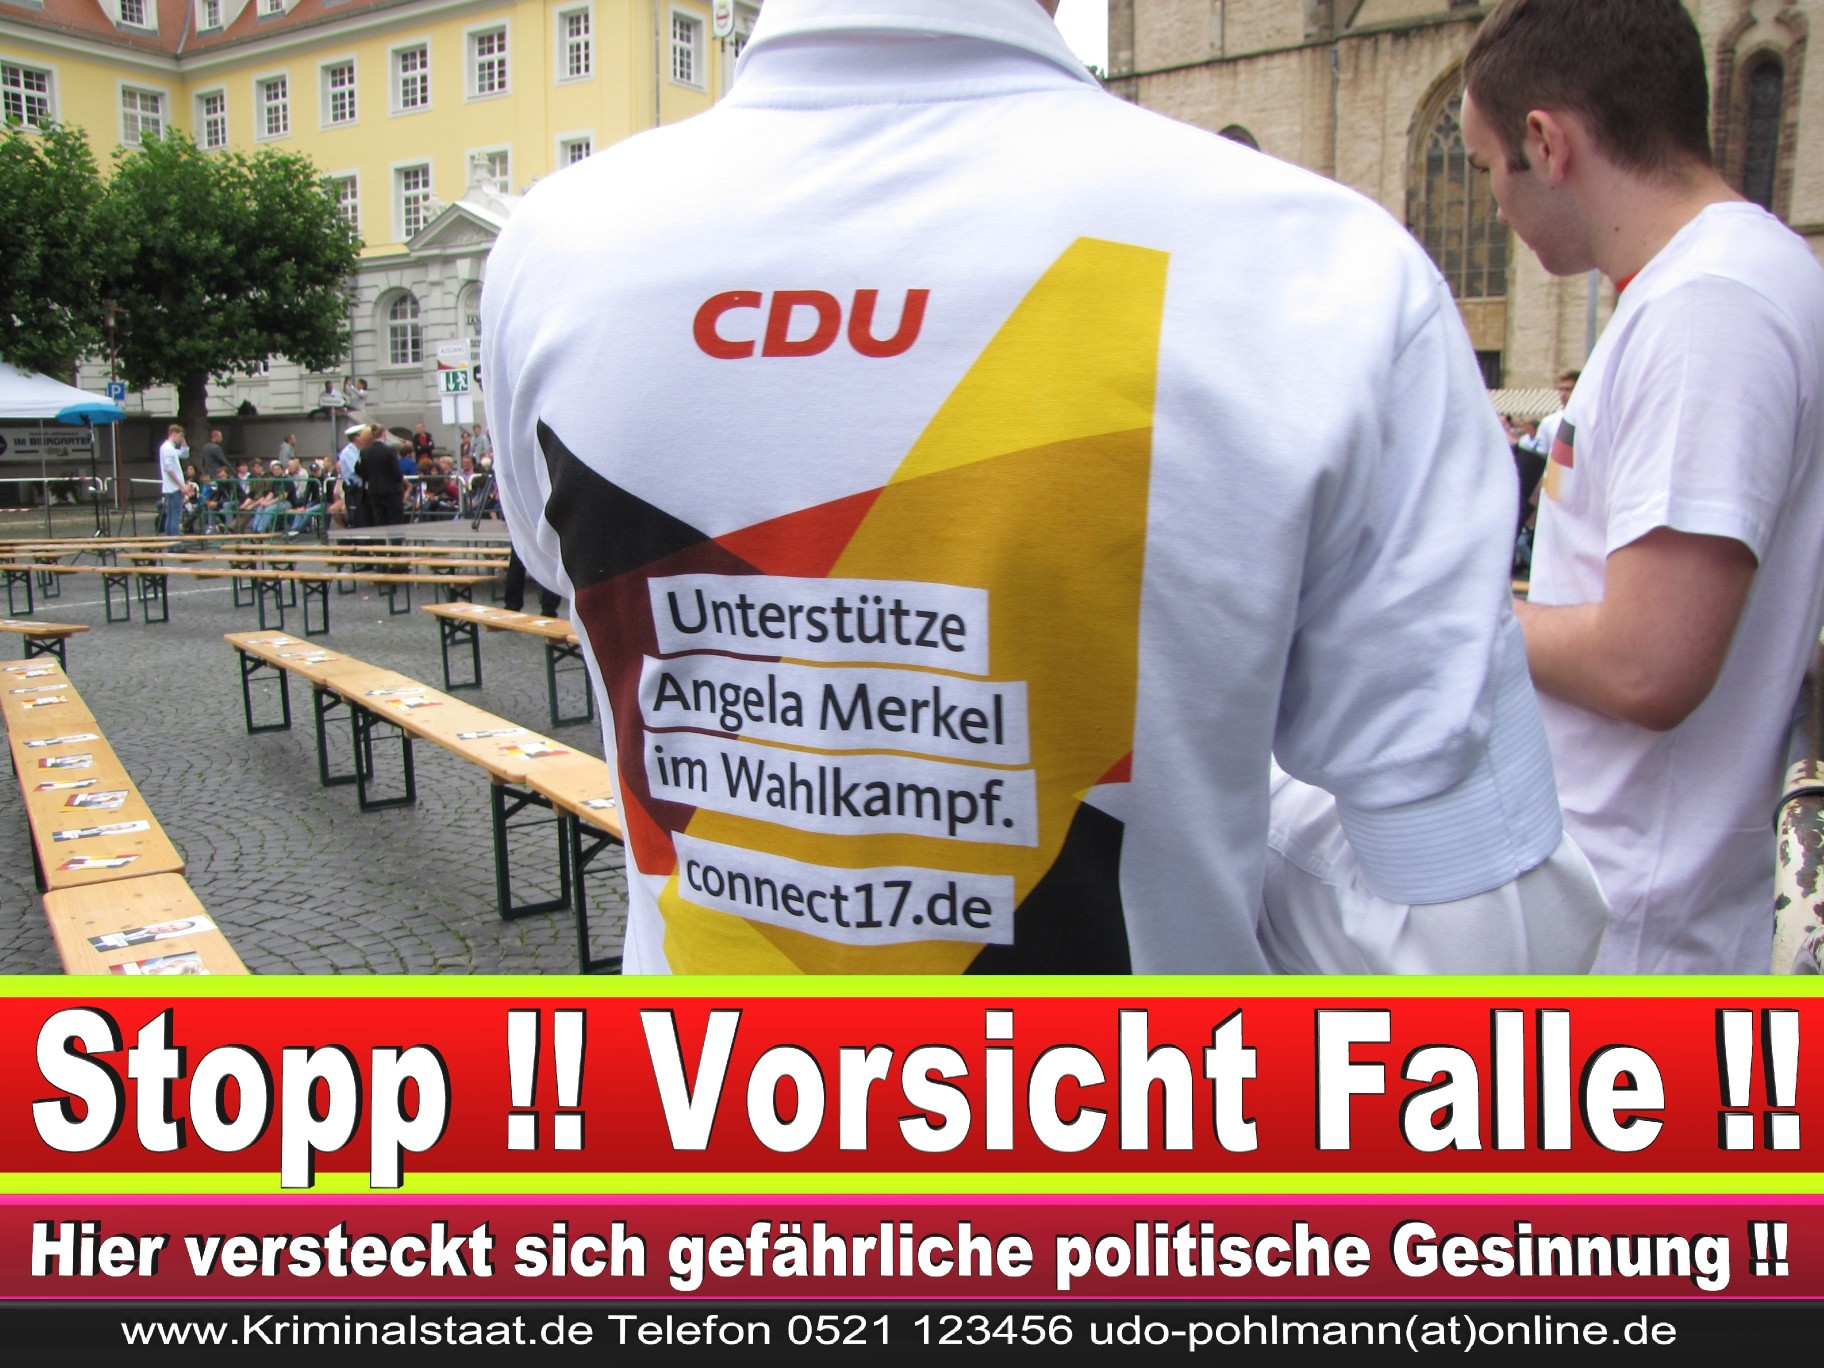 CDU HERFORD Kurruption Betrug Kinderpornografie Kinderpornos 10